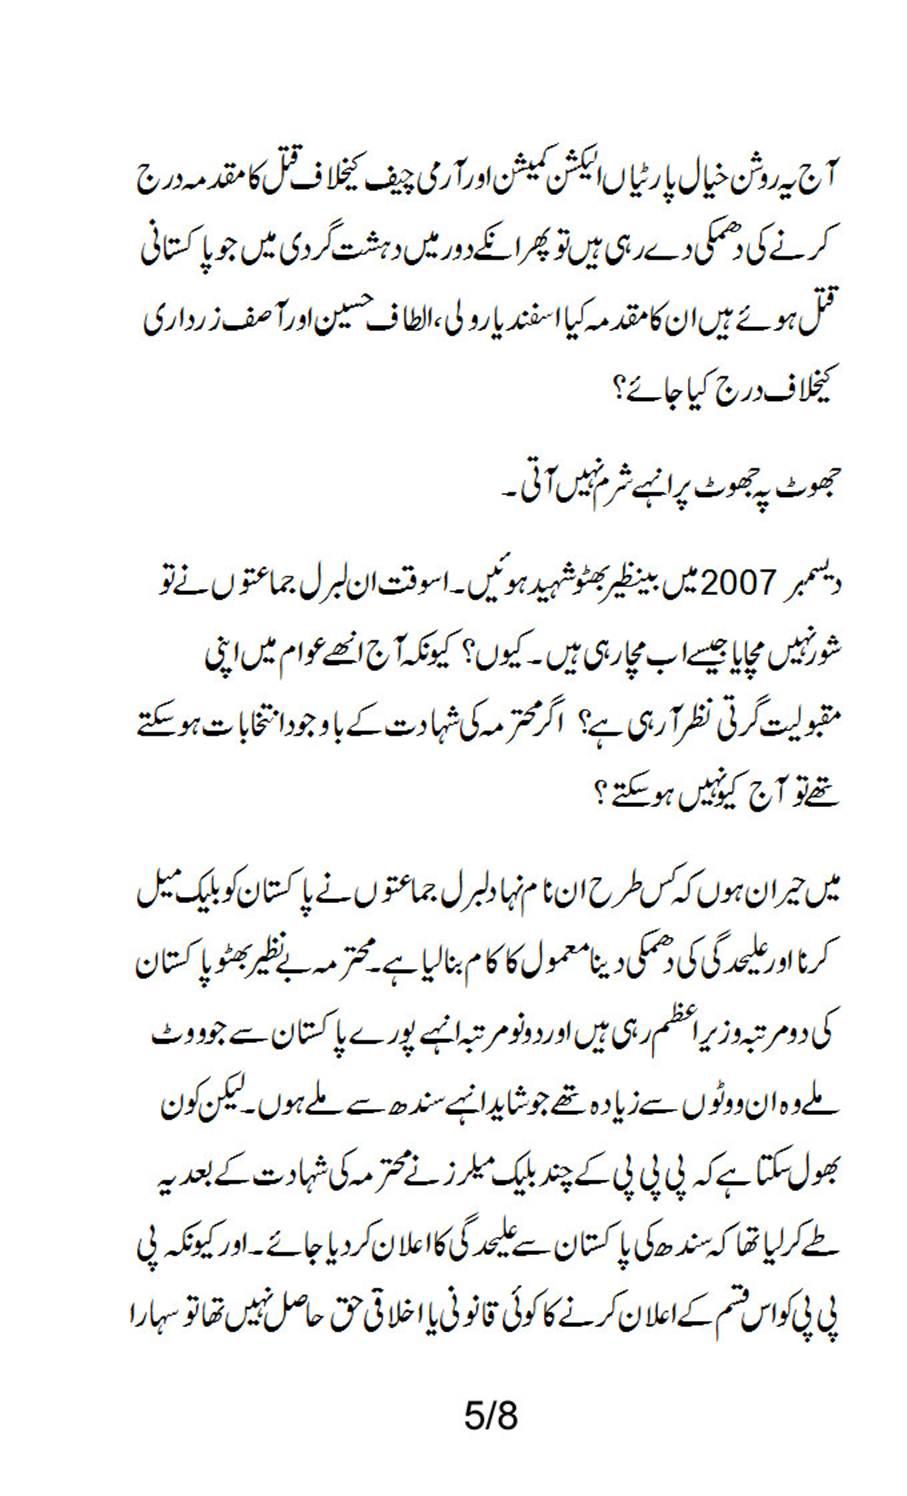 pakistan politics Pakpoliticalcom is an online political web portal - pakistani talk shows, comedy shows, political news, sports updates and breaking news.